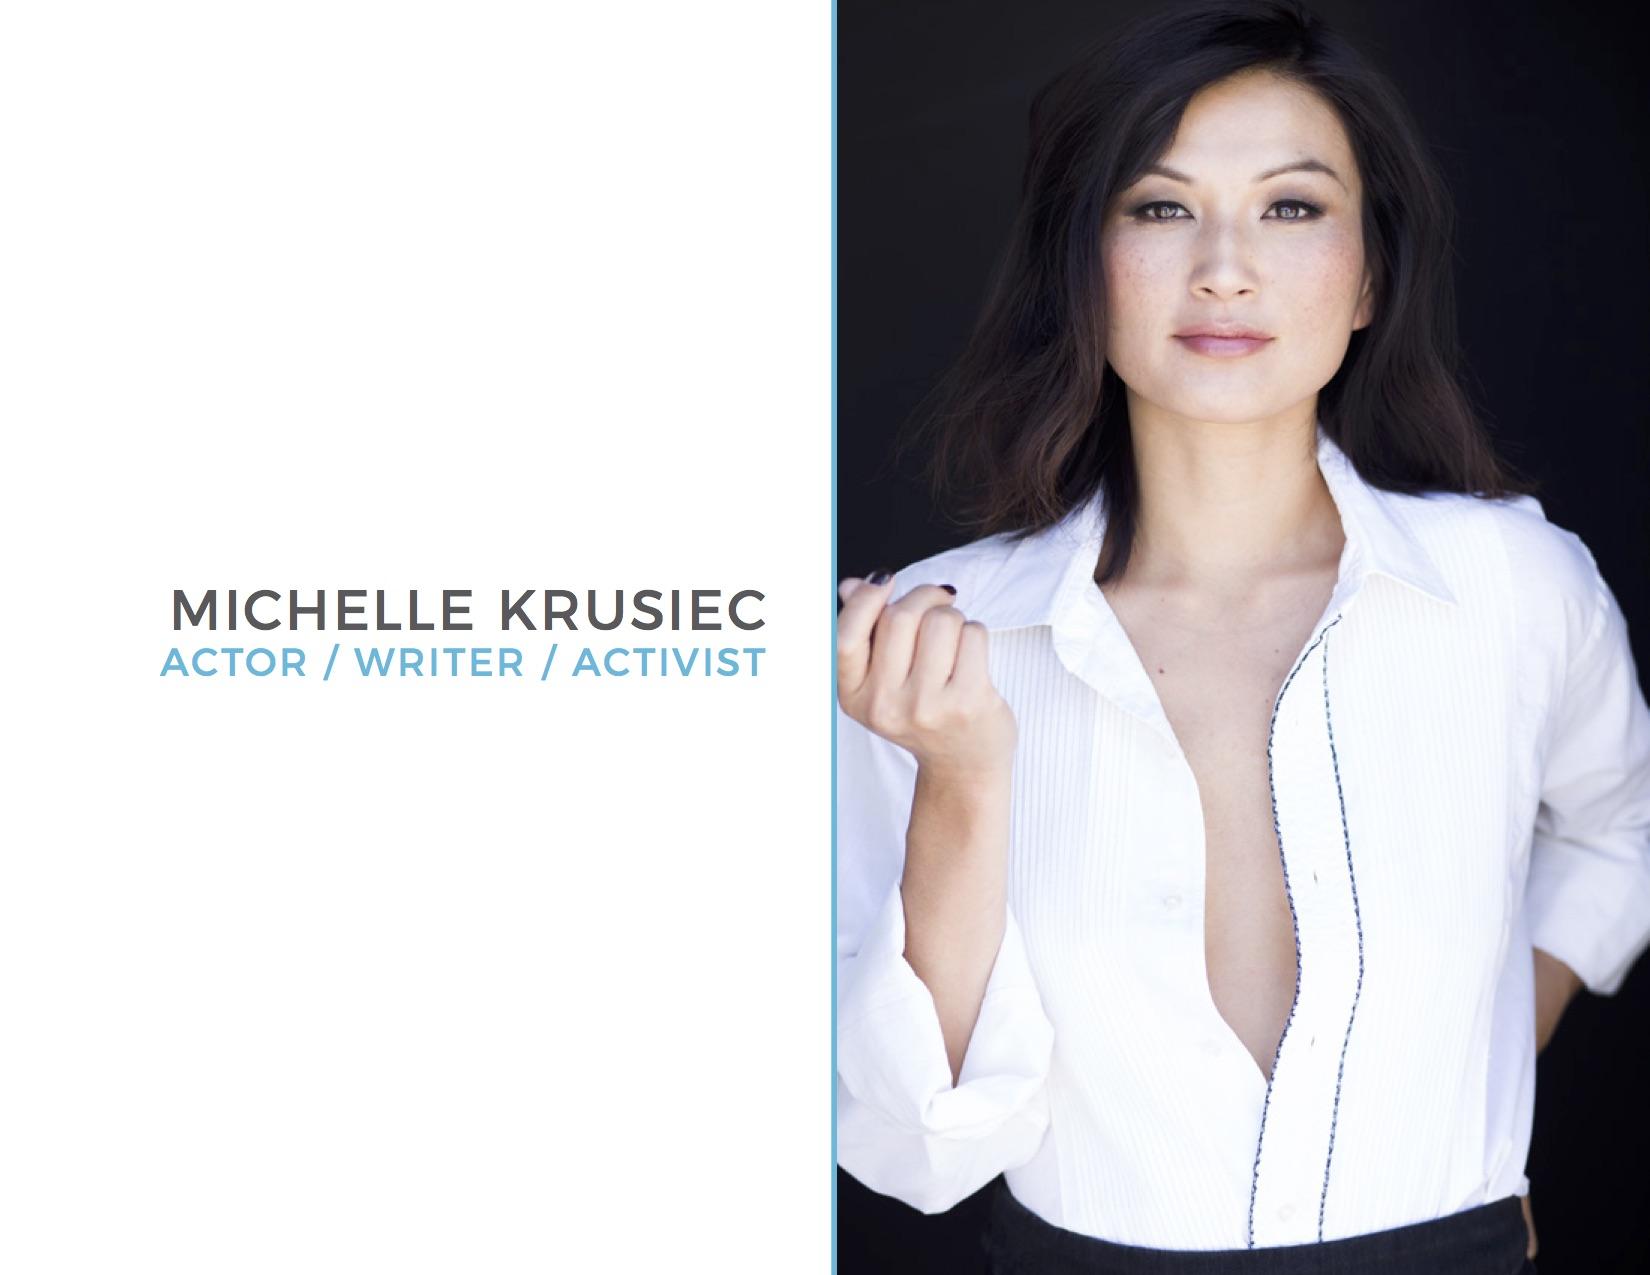 Michelle Krusiec Press Kit